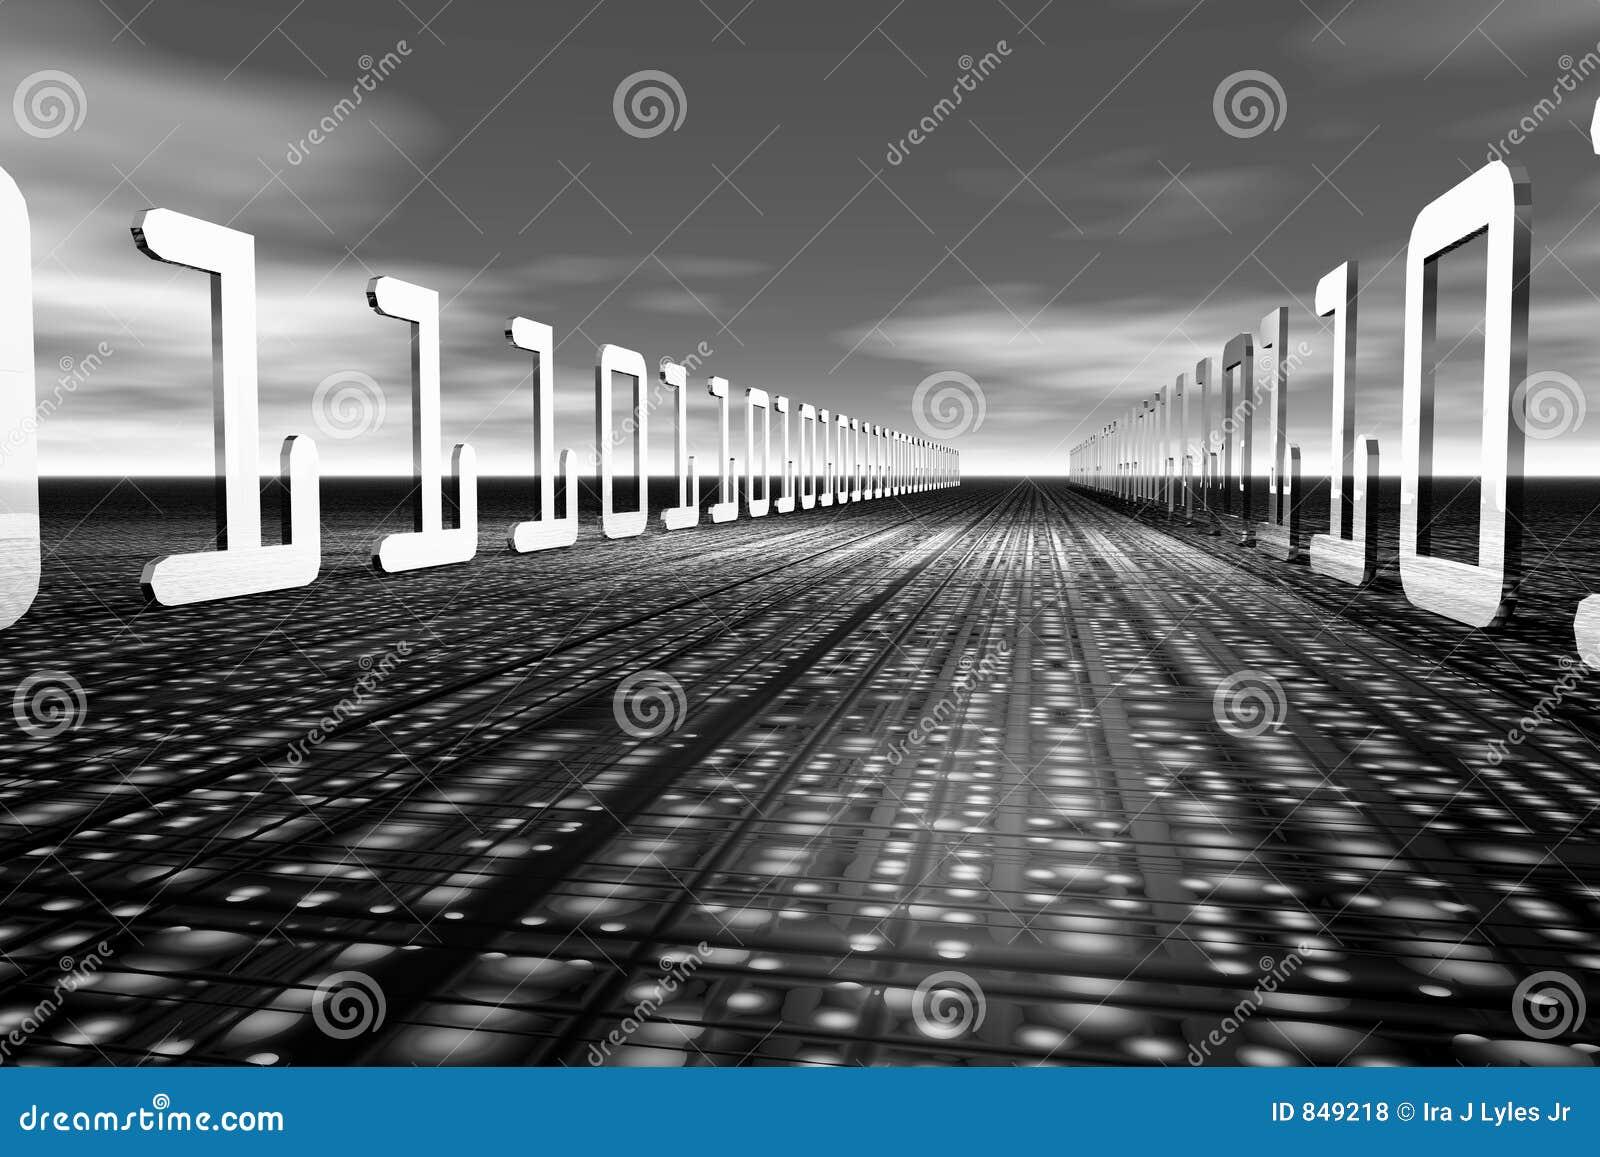 Information-Highway3